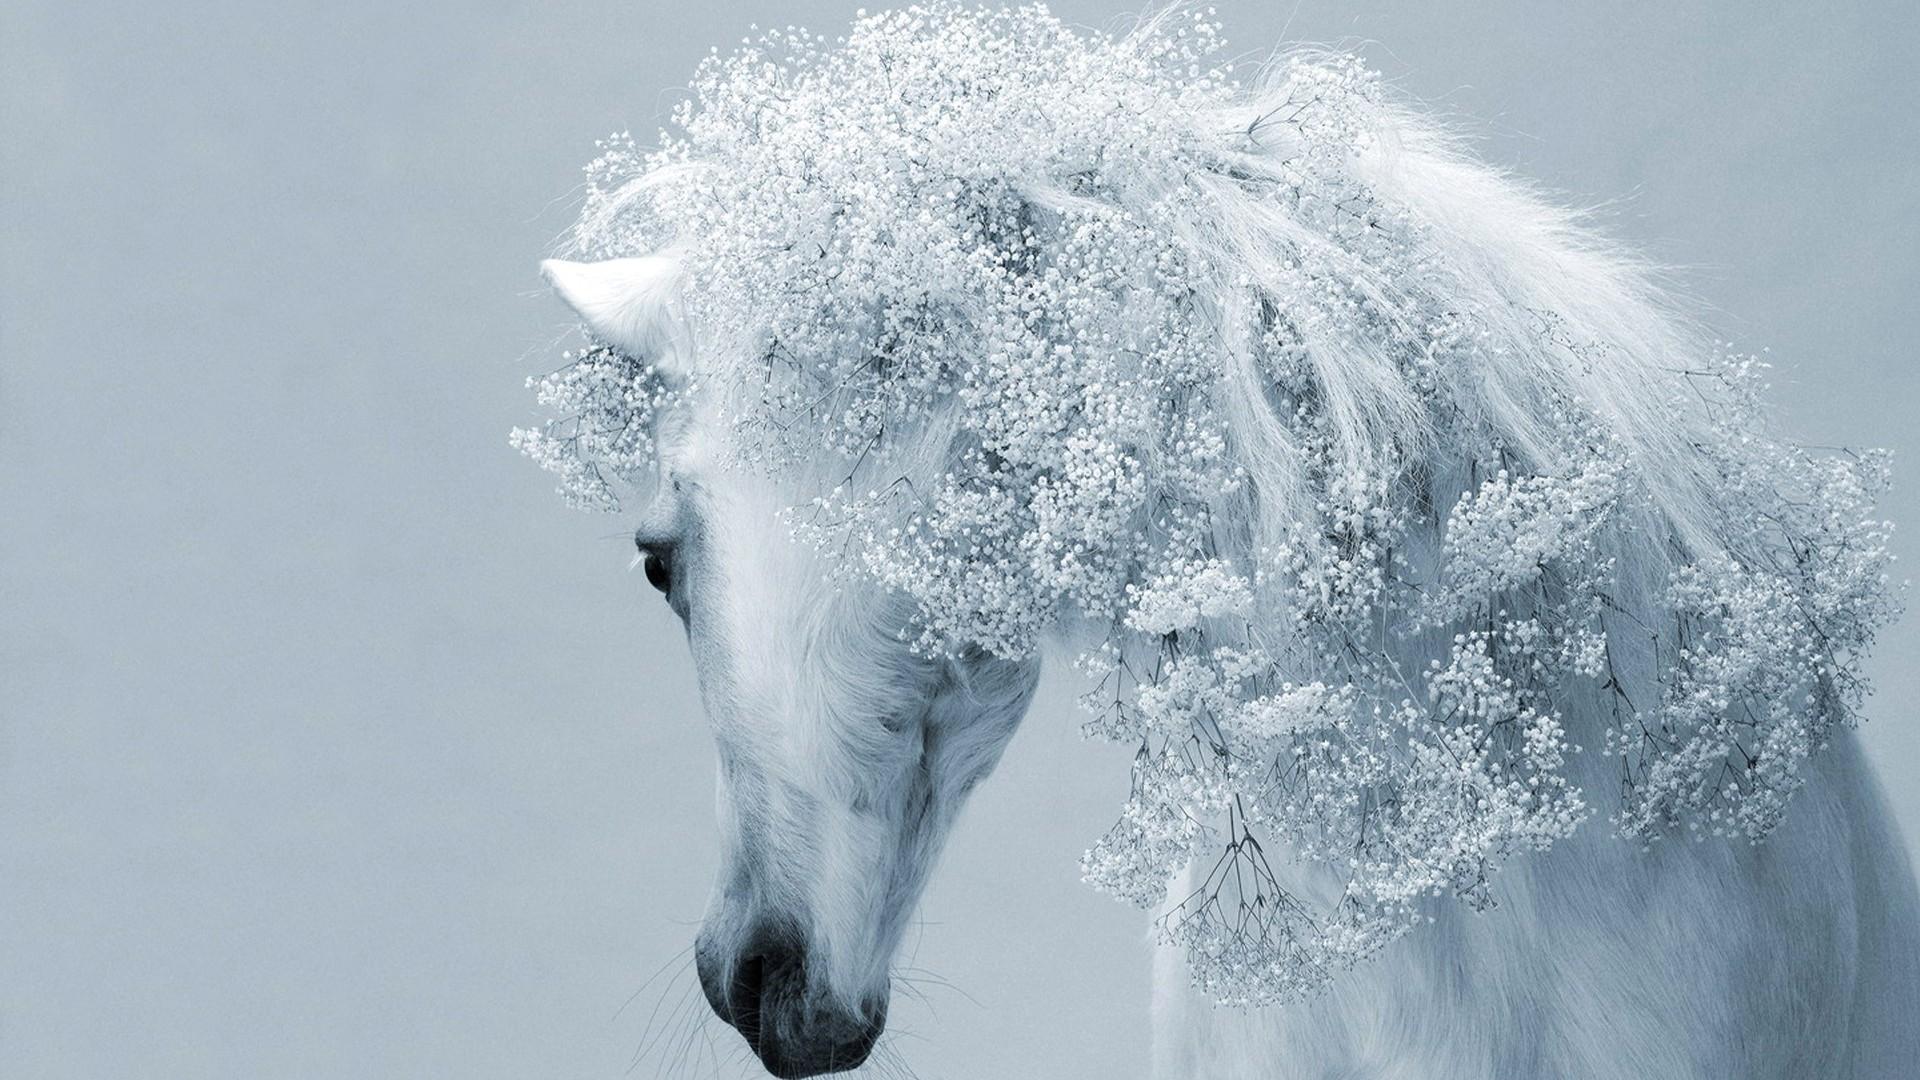 White Horse Wallpaper HD   Magic4Wallscom 1920x1080